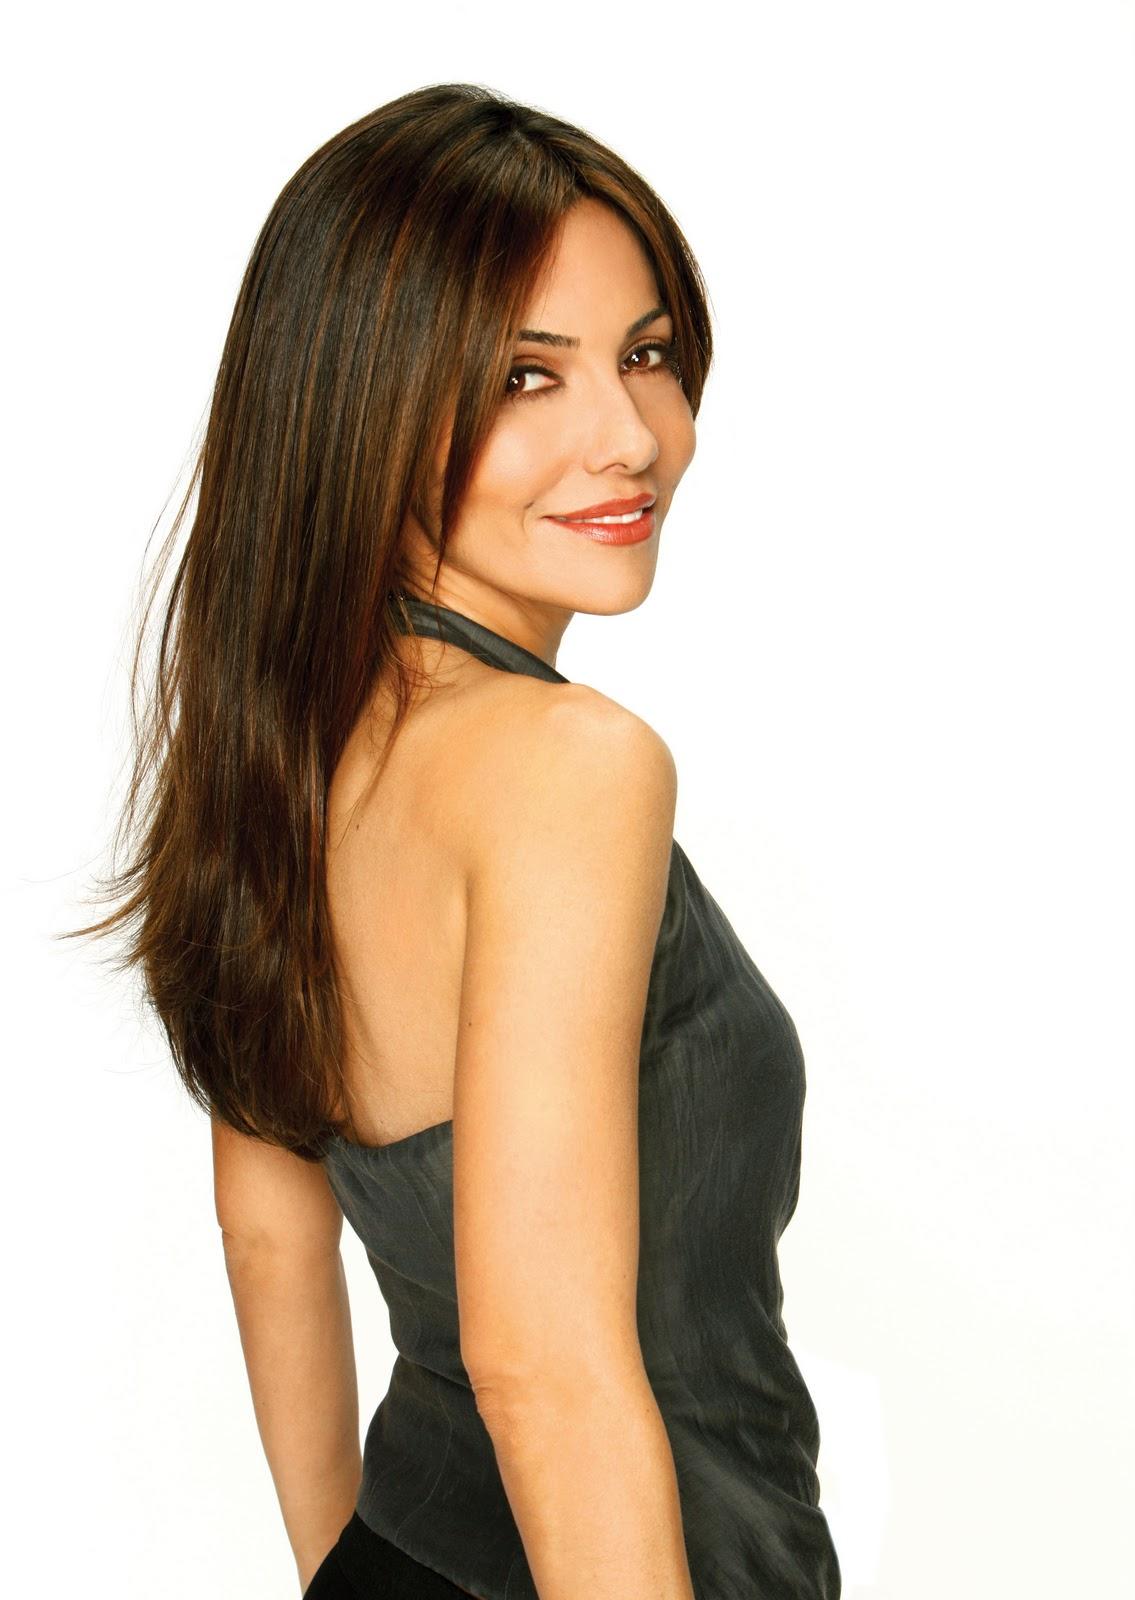 http://2.bp.blogspot.com/-Mhuahn4KpvA/Taf2Es46d-I/AAAAAAAAXnA/x1UWJXyCv2g/s1600/VanessaMarcil.jpg